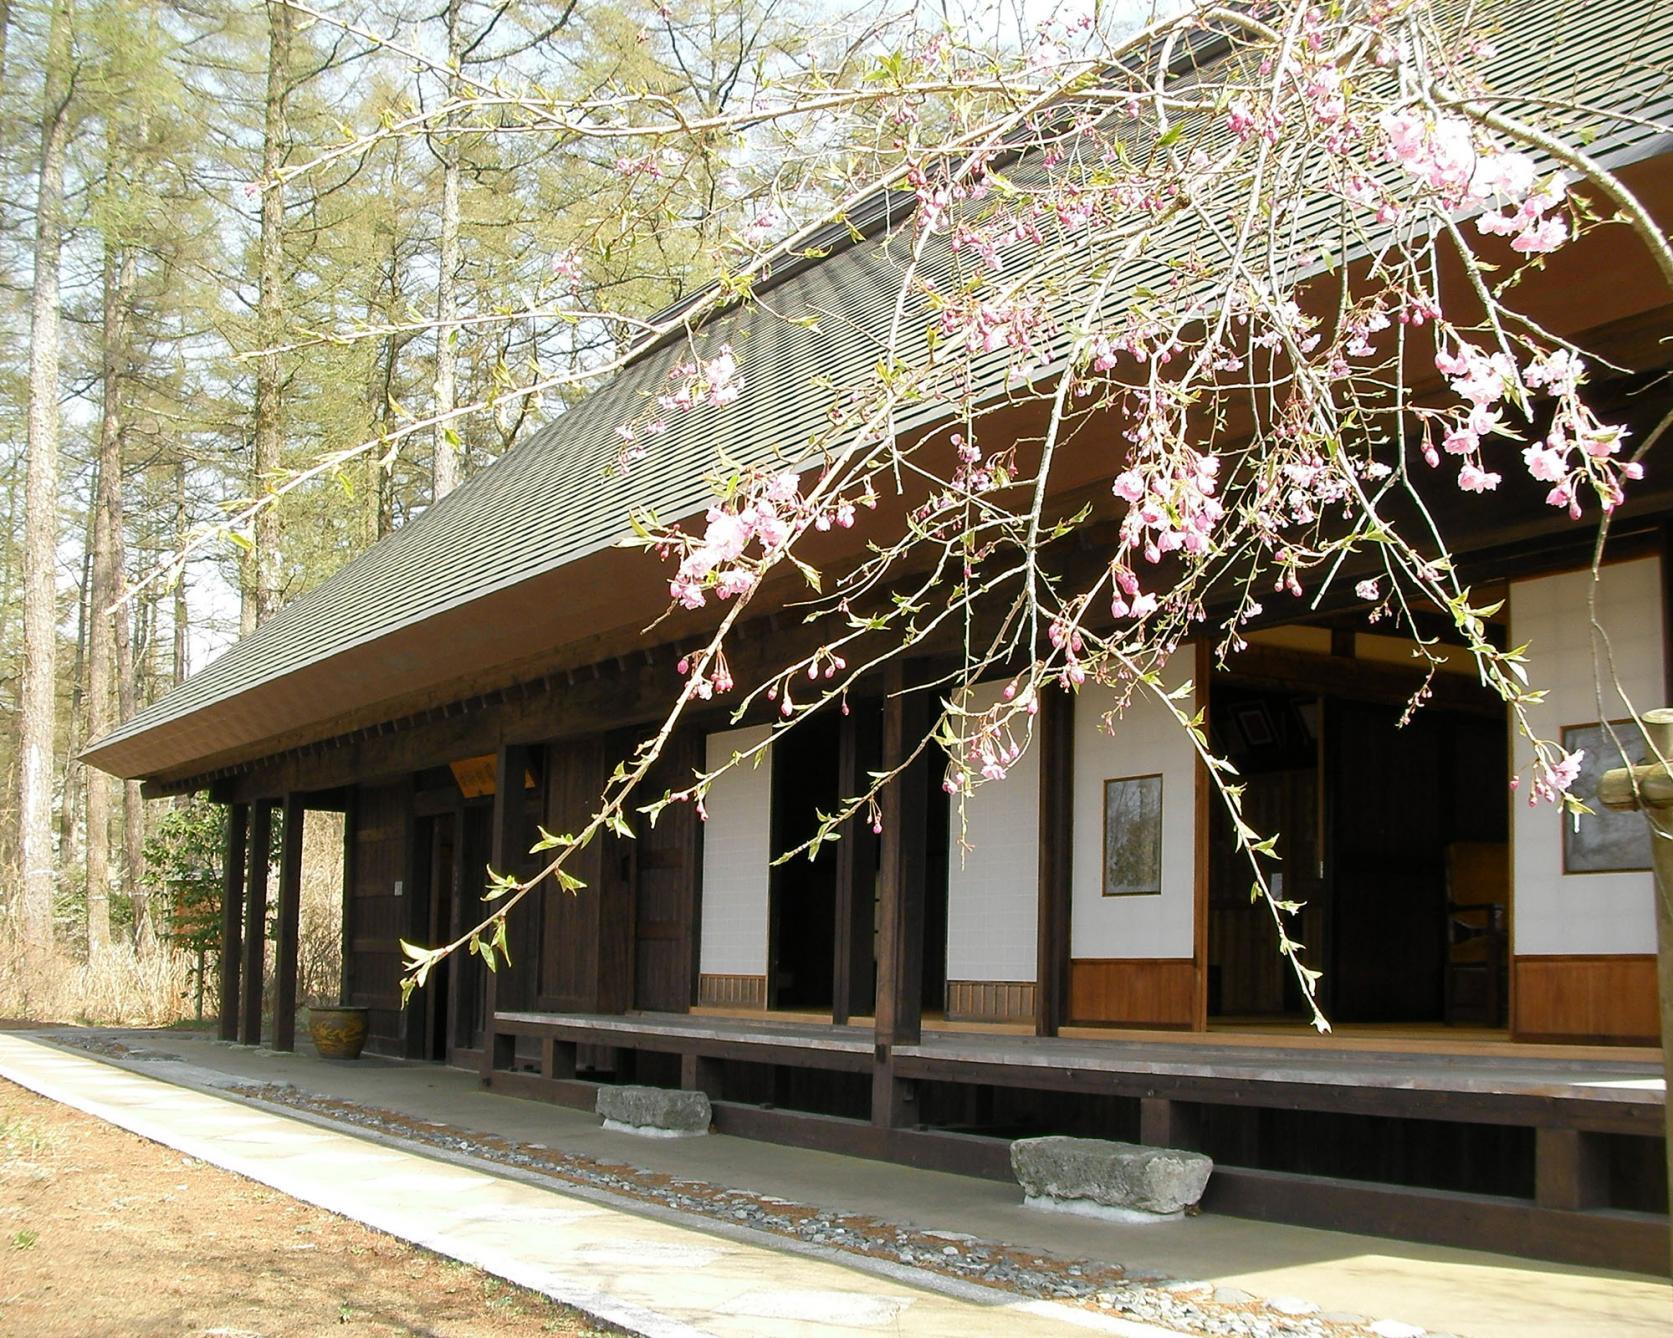 Yamanakako Bungaku no mori Kouen(Park of literature)-1